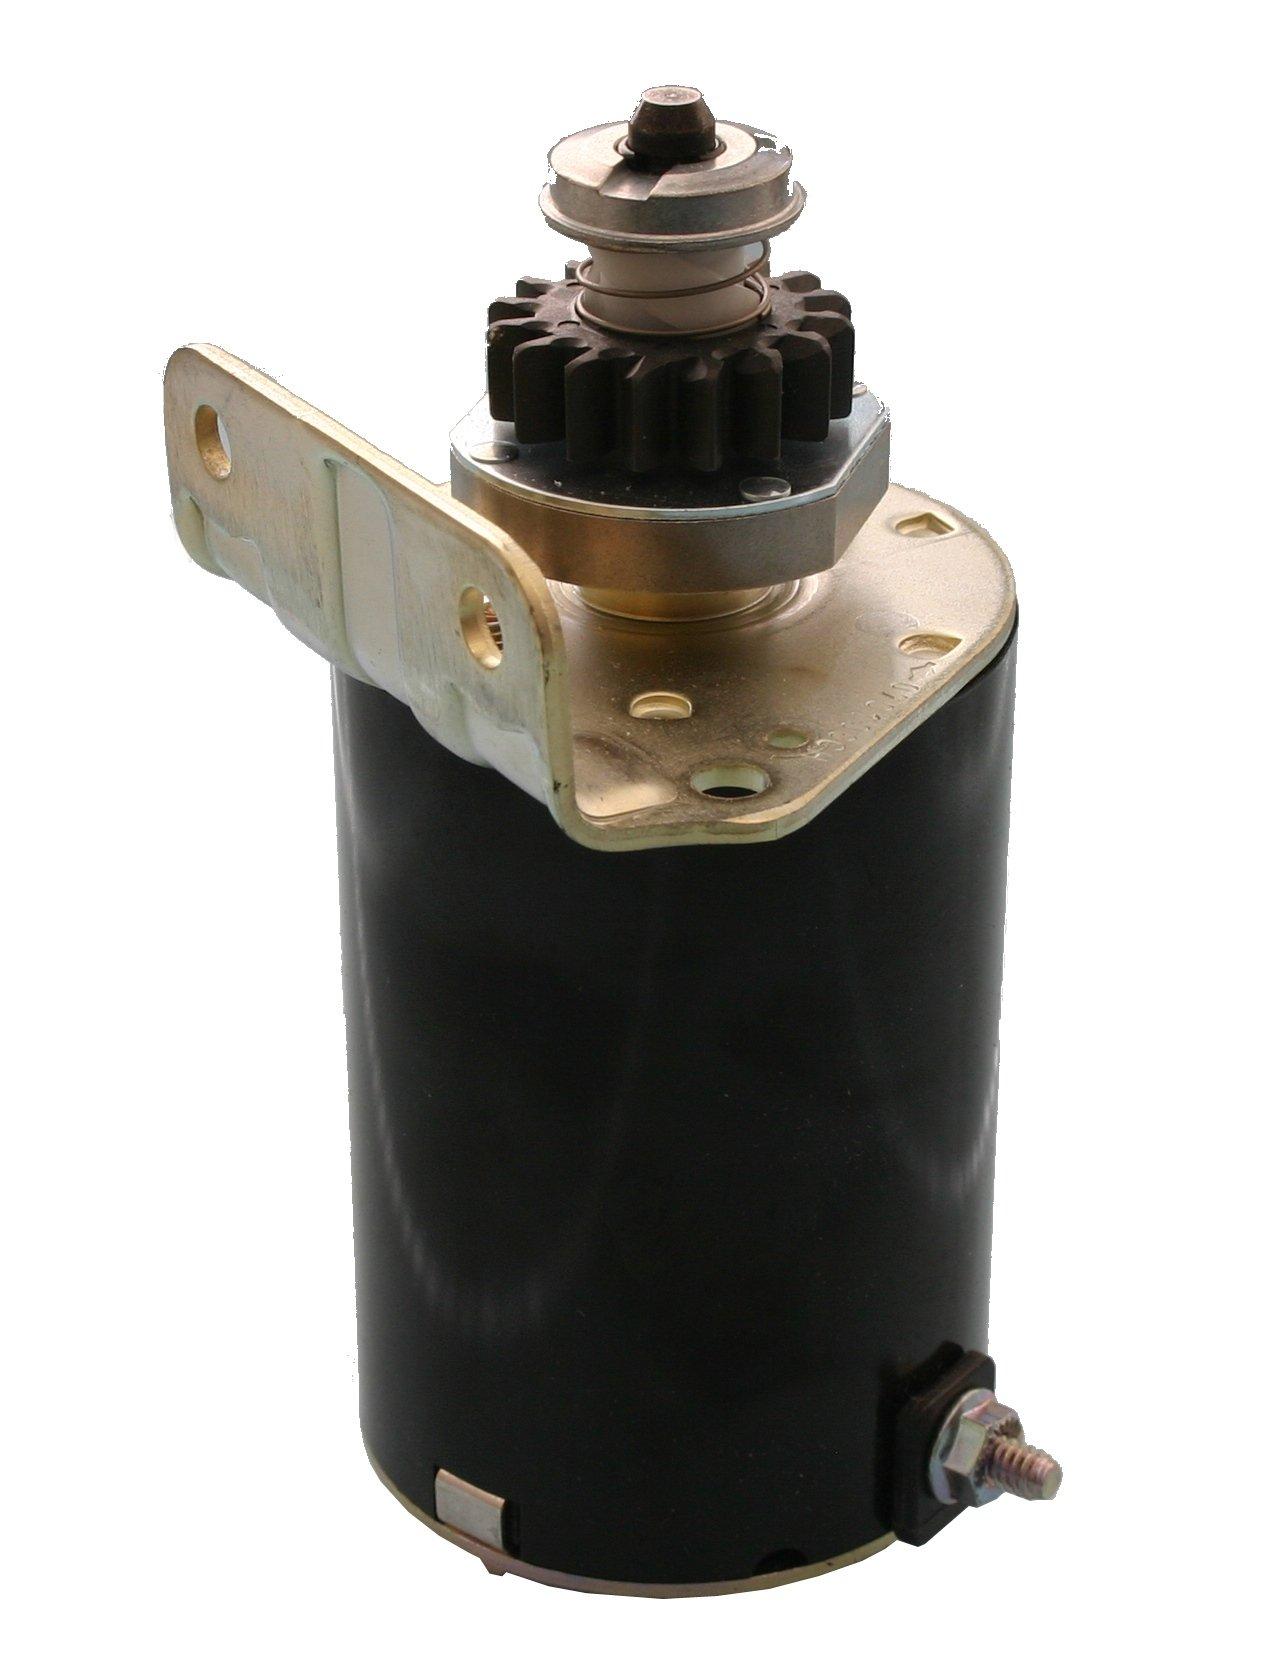 Briggs & Stratton 795121 Starter Motor Replaces 499521/497461/497401